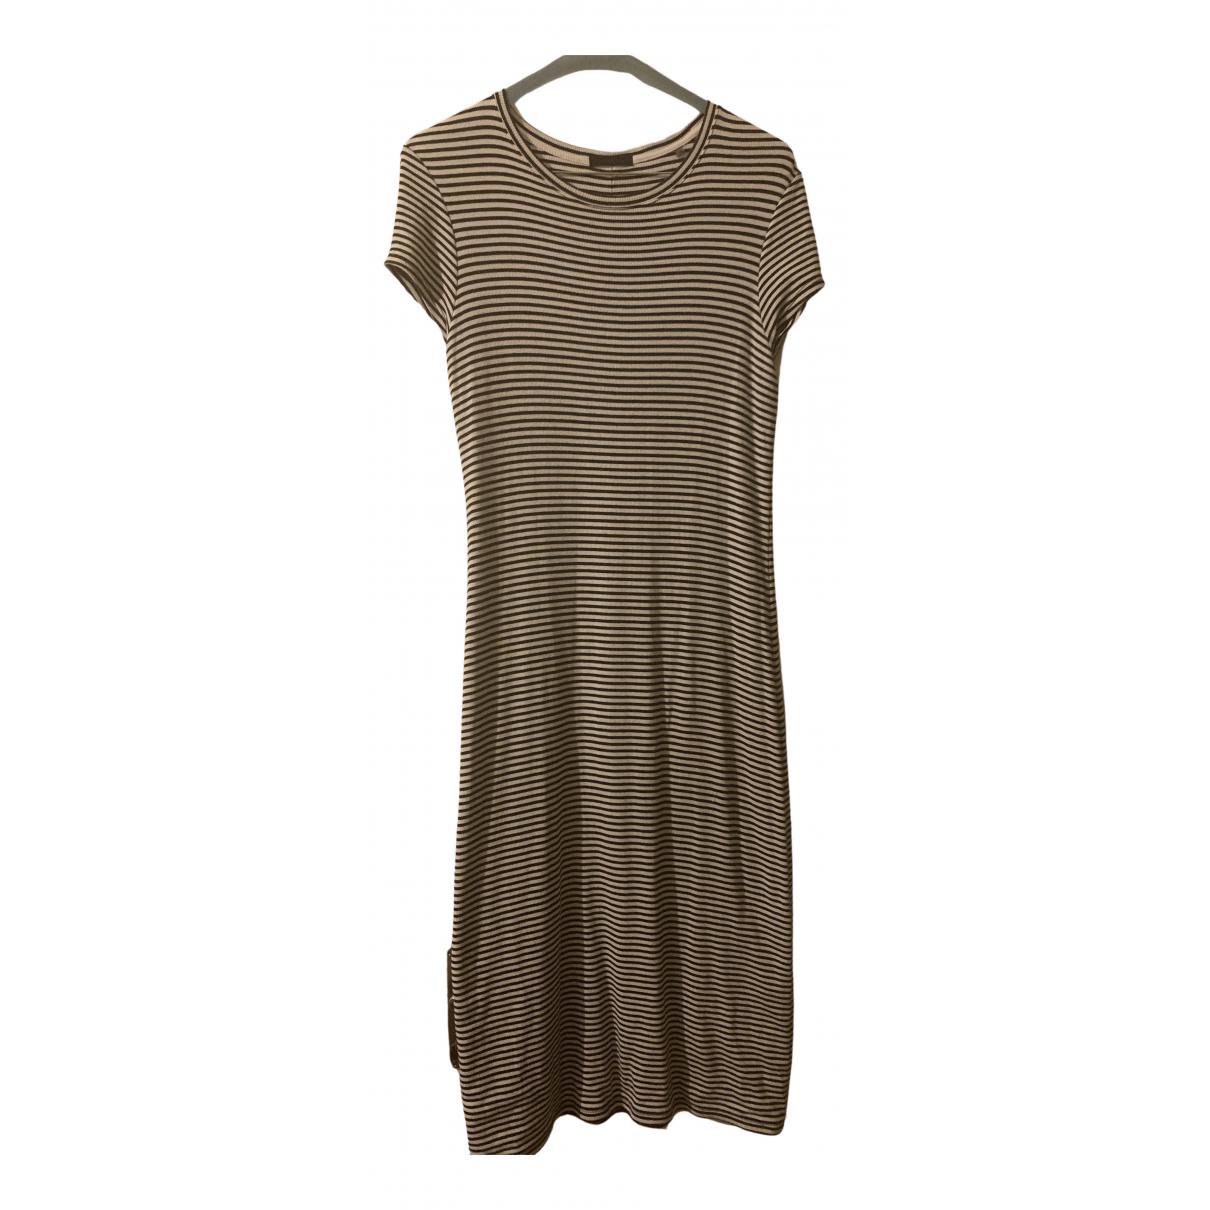 Atm N Cotton dress for Women M International